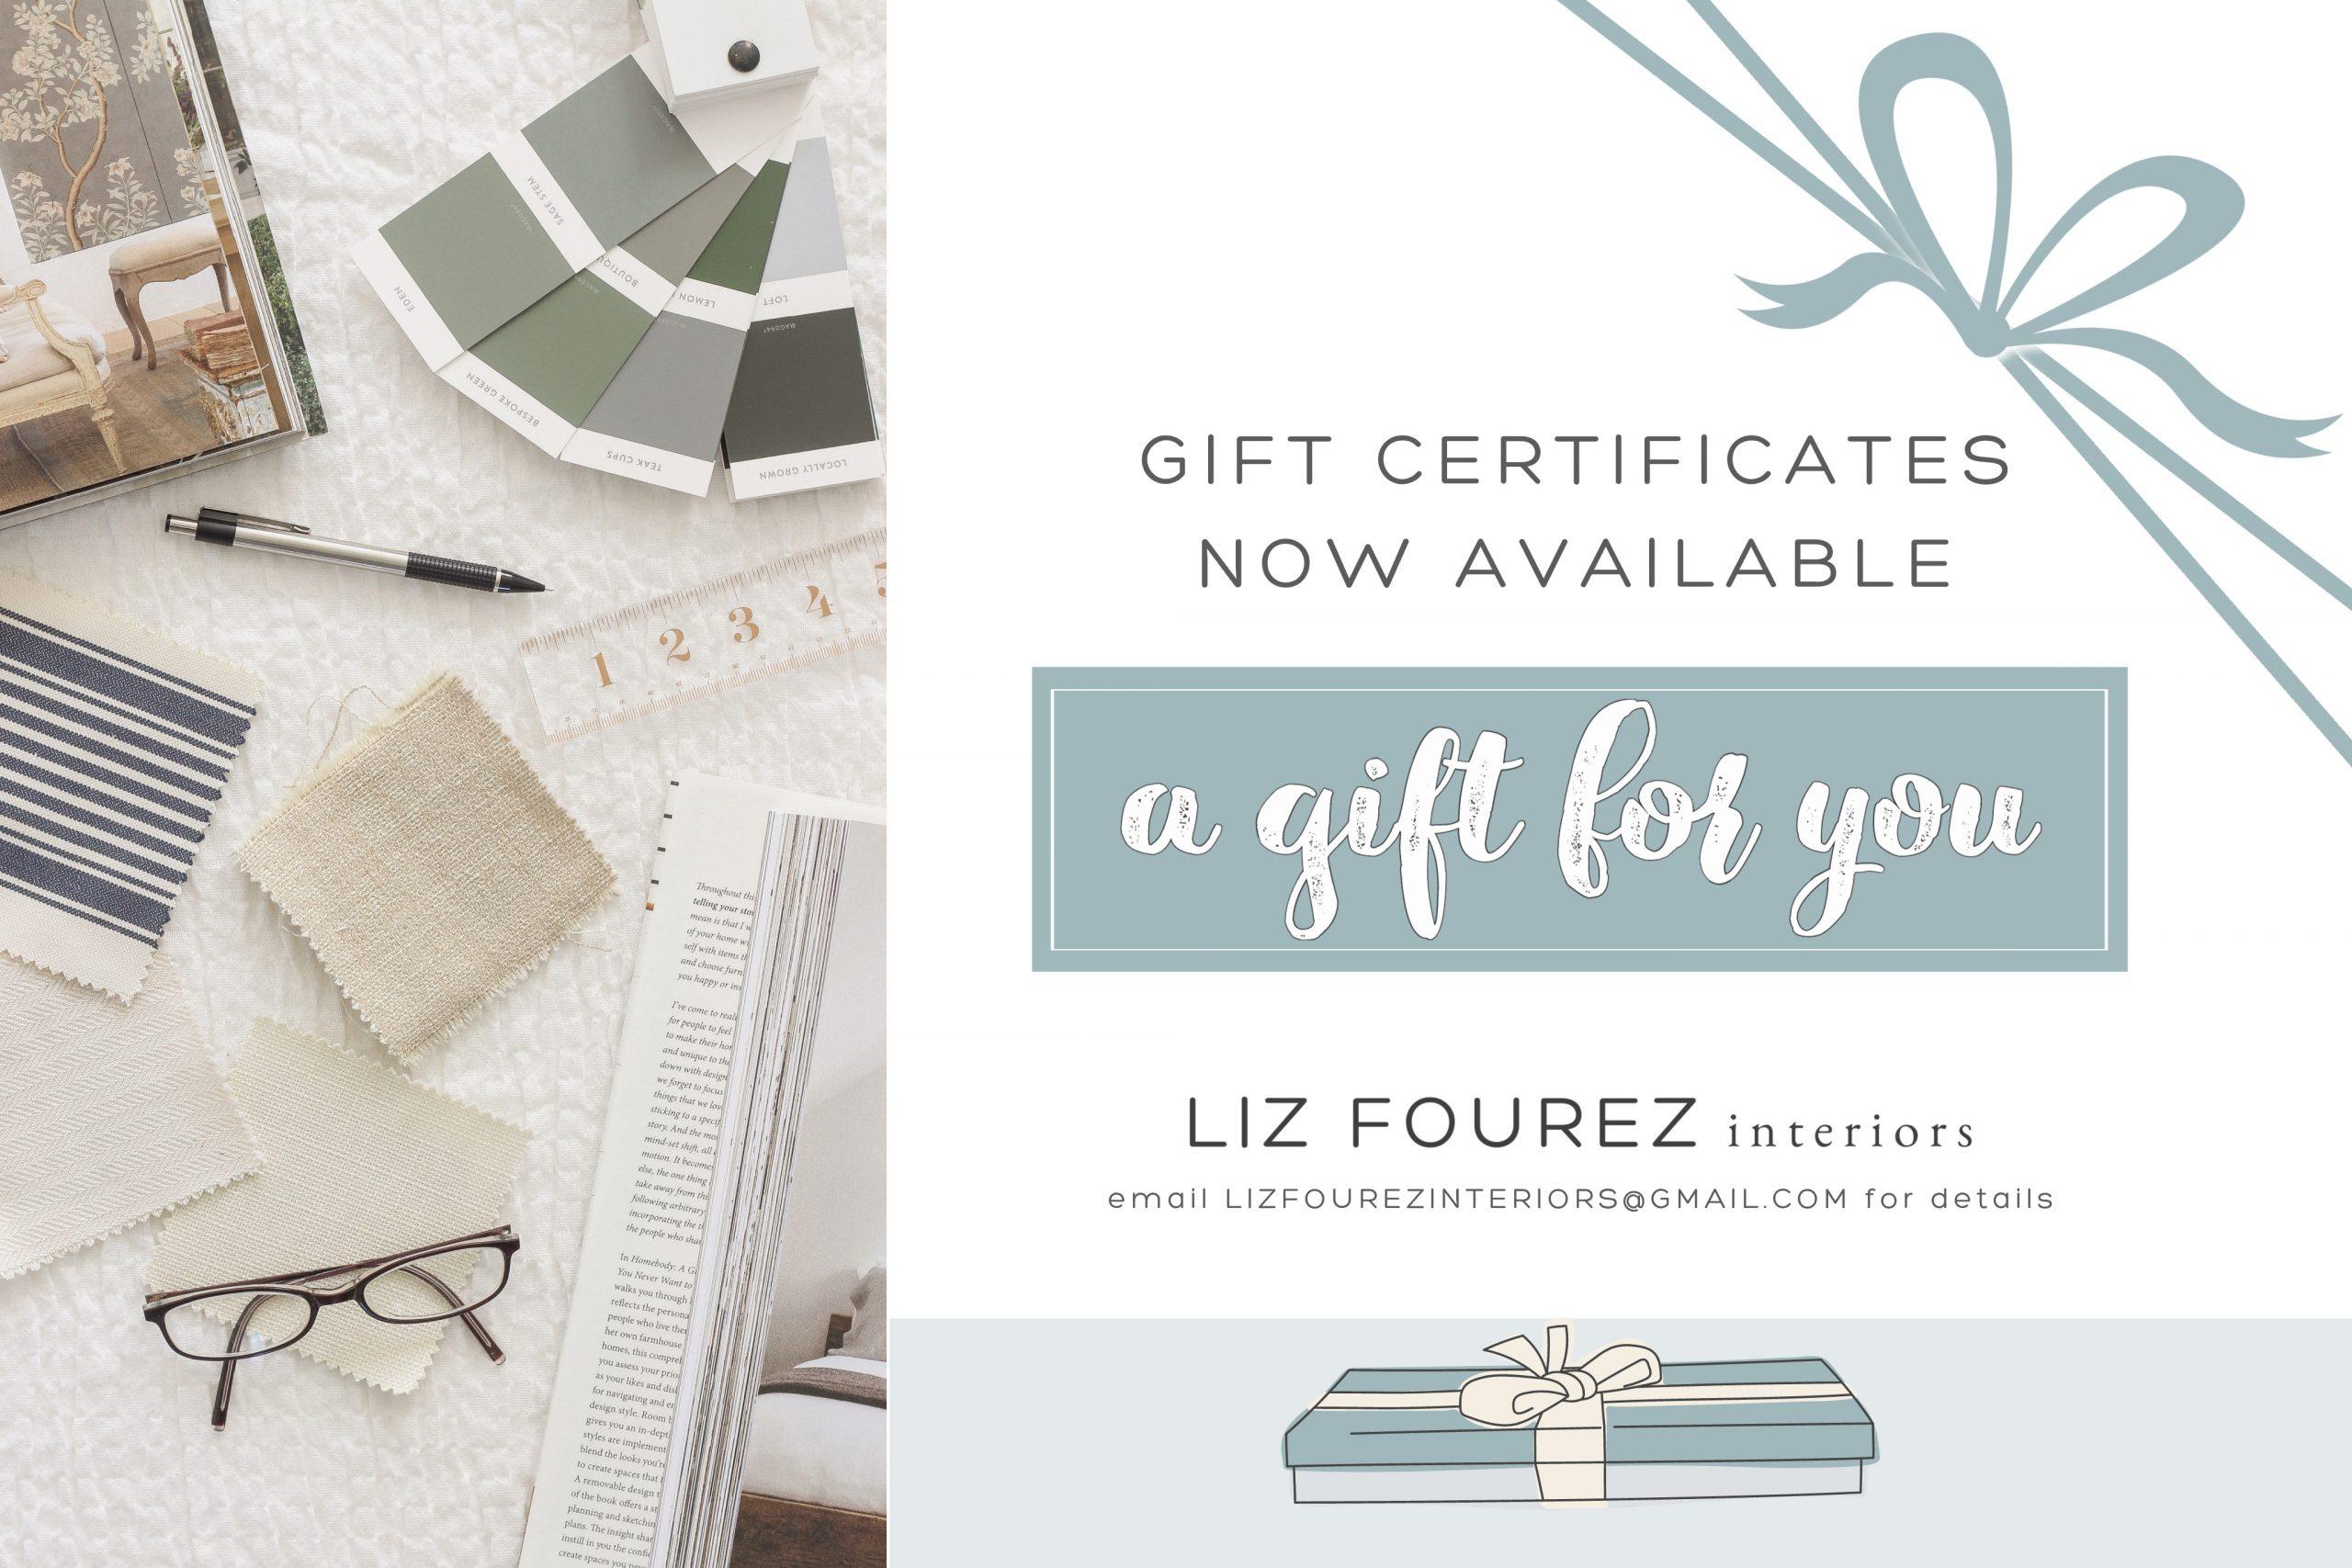 Liz Fourez Interior Gift Certificates Available